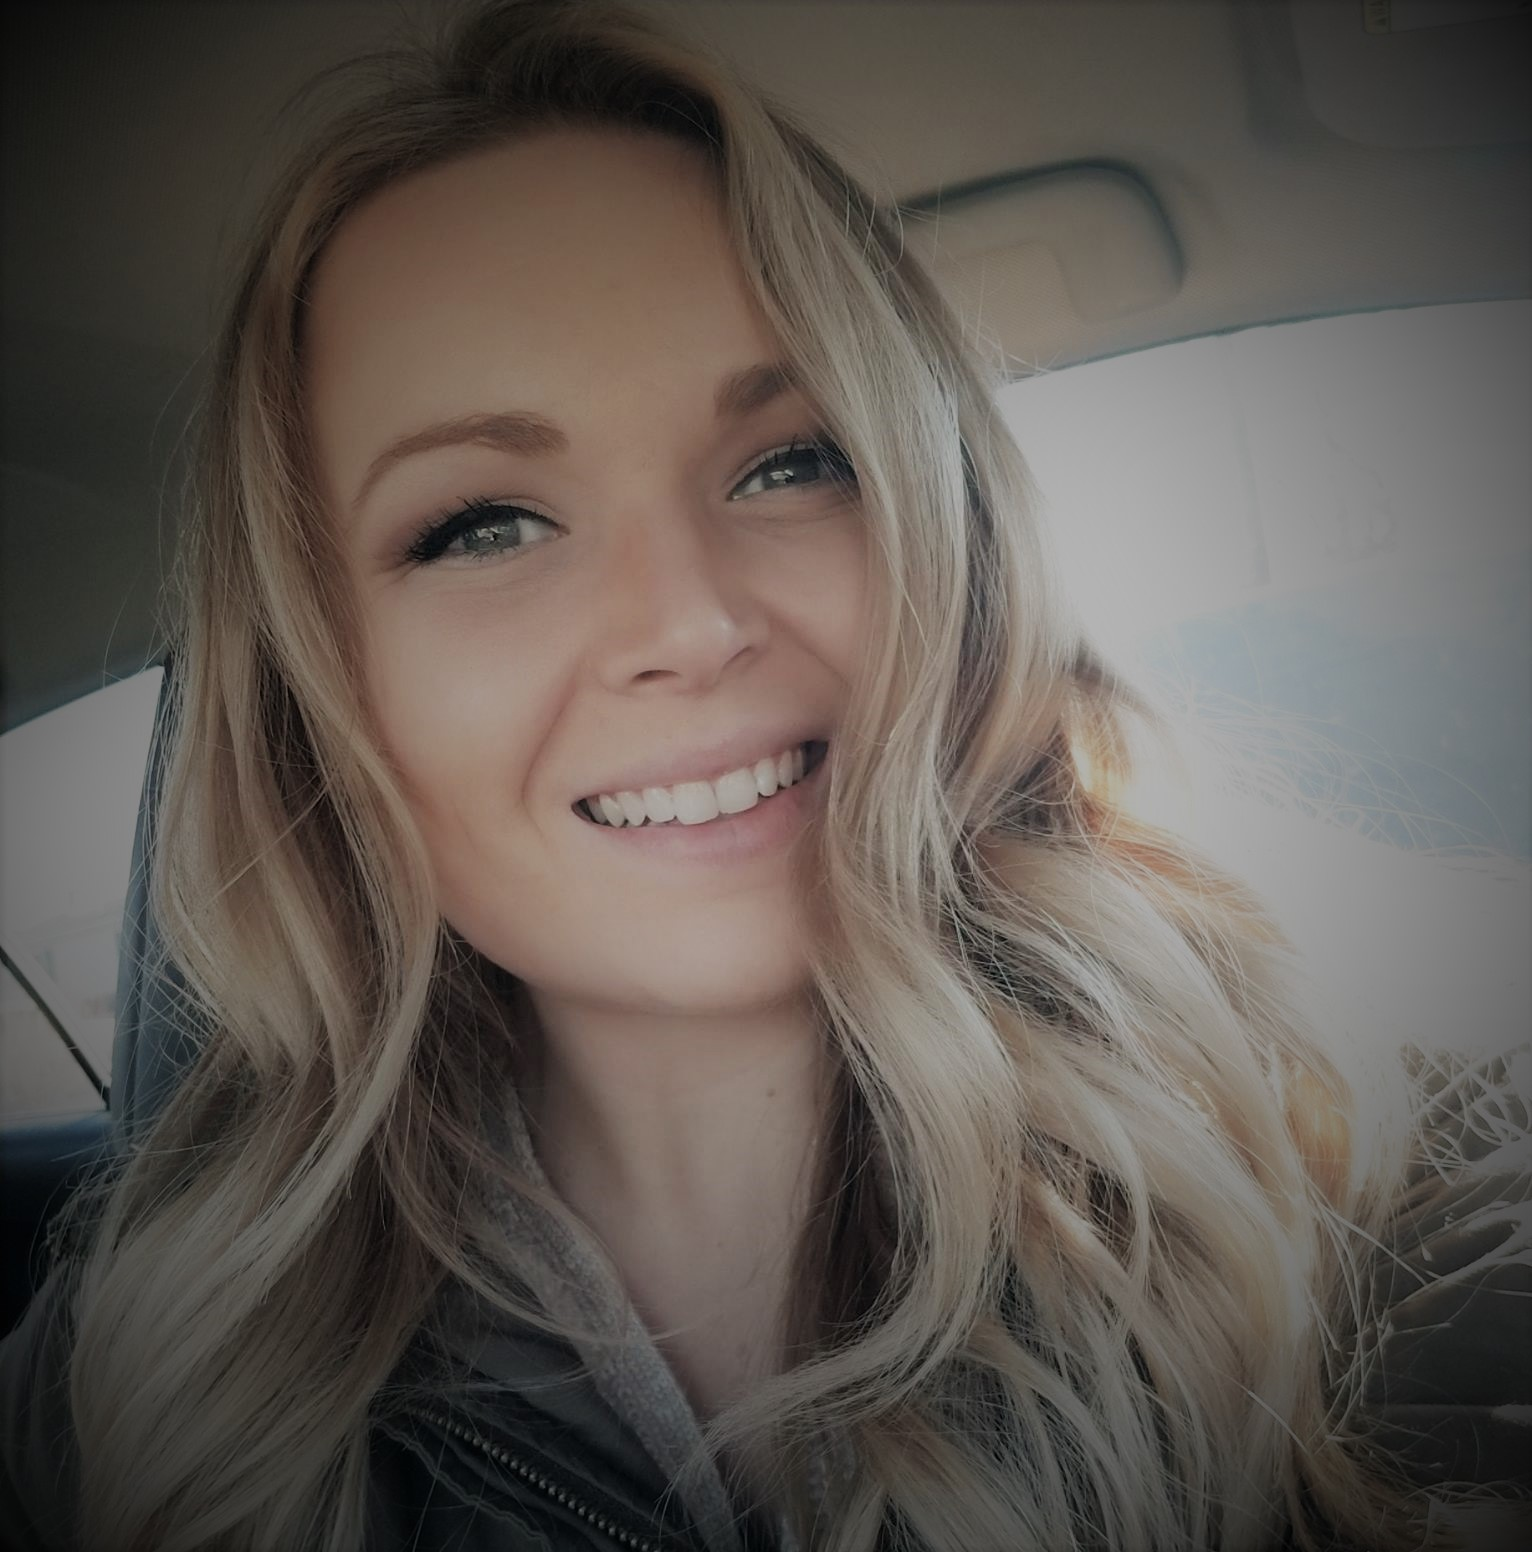 Amanda Cimino